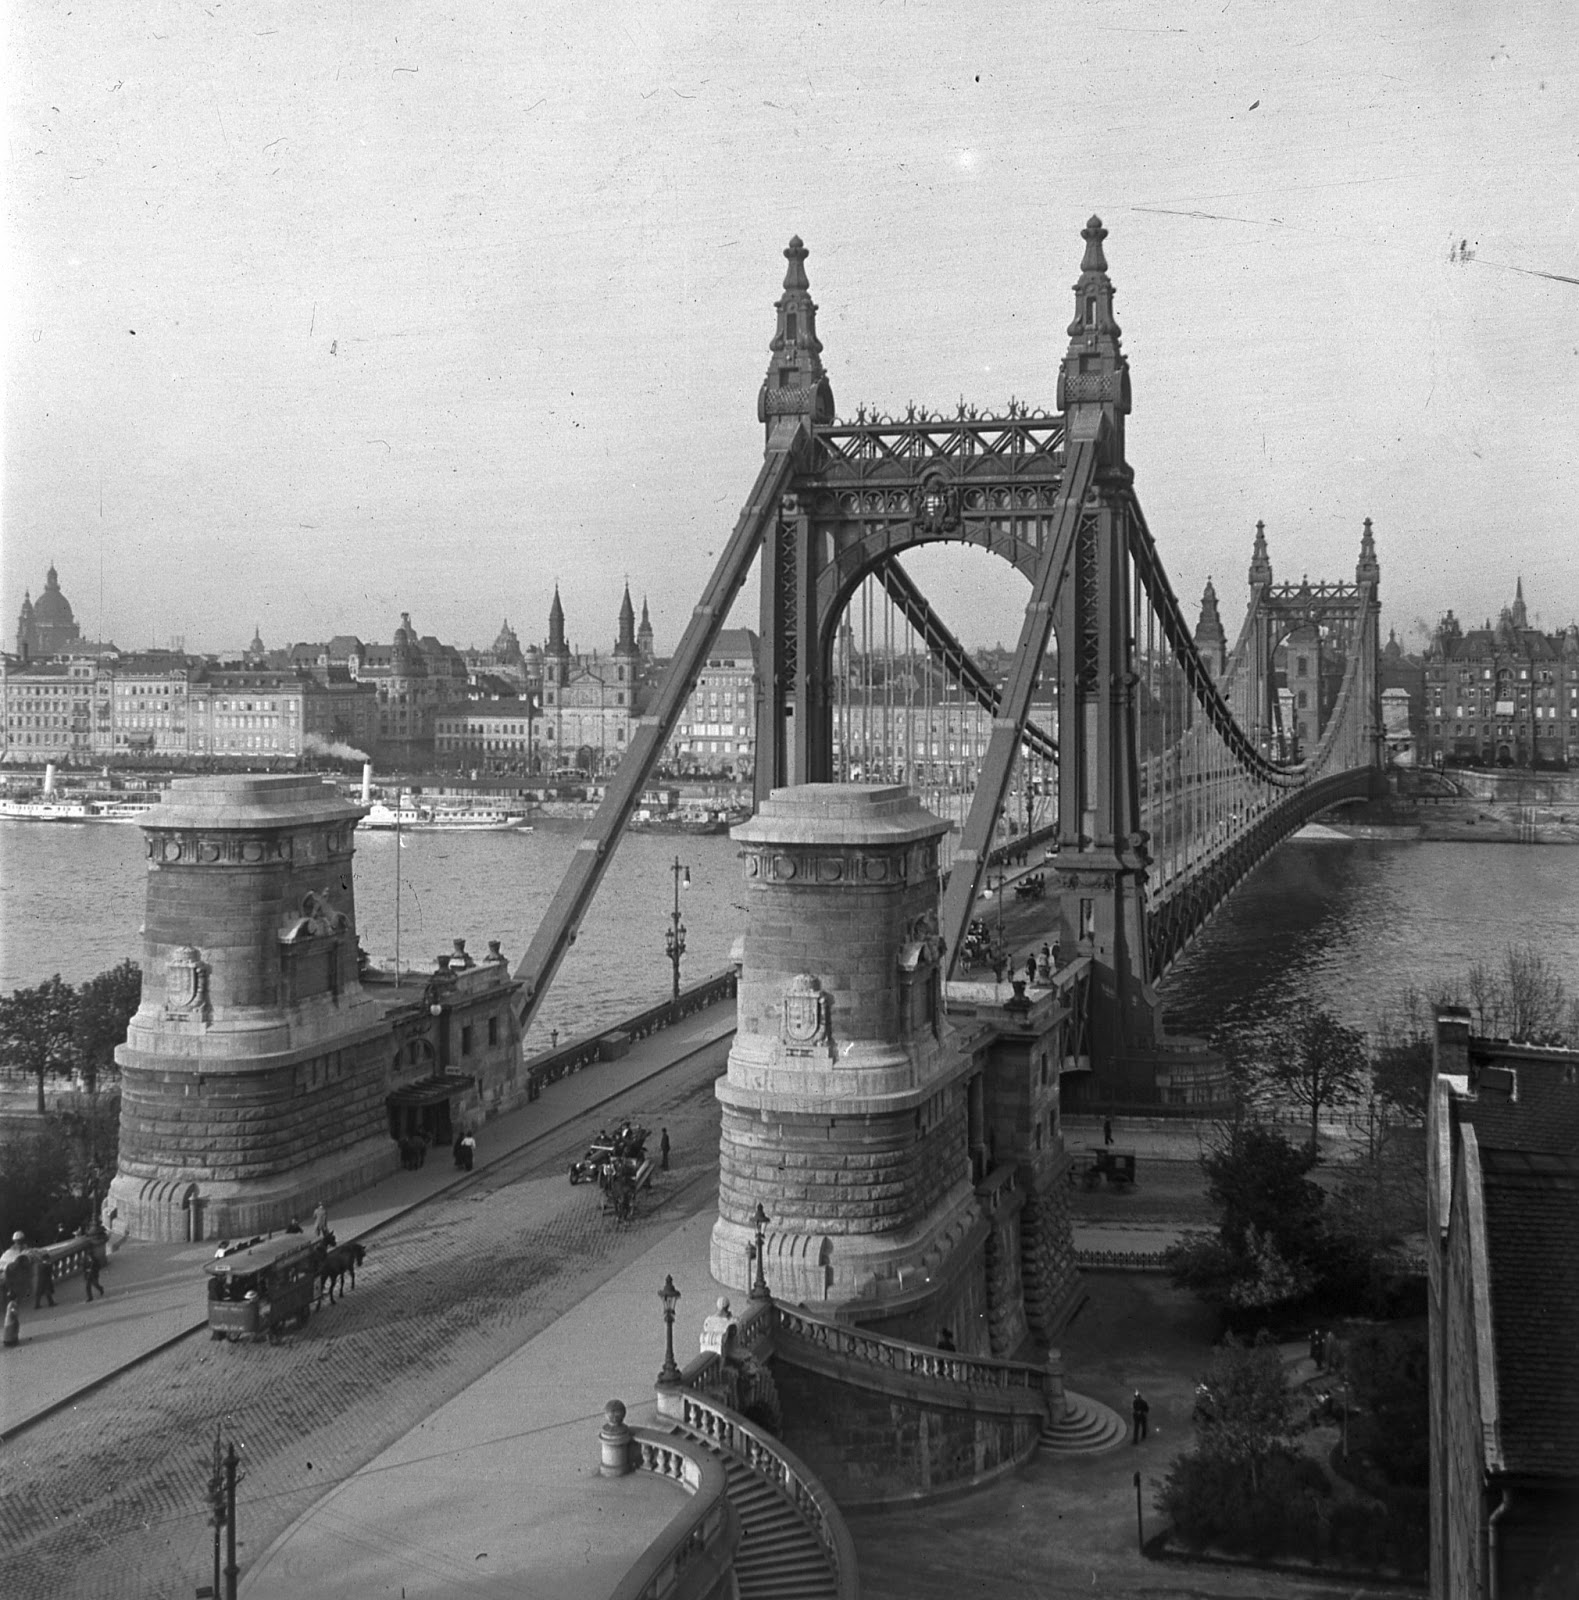 Donauinseln: Most beautiful bridge in the world